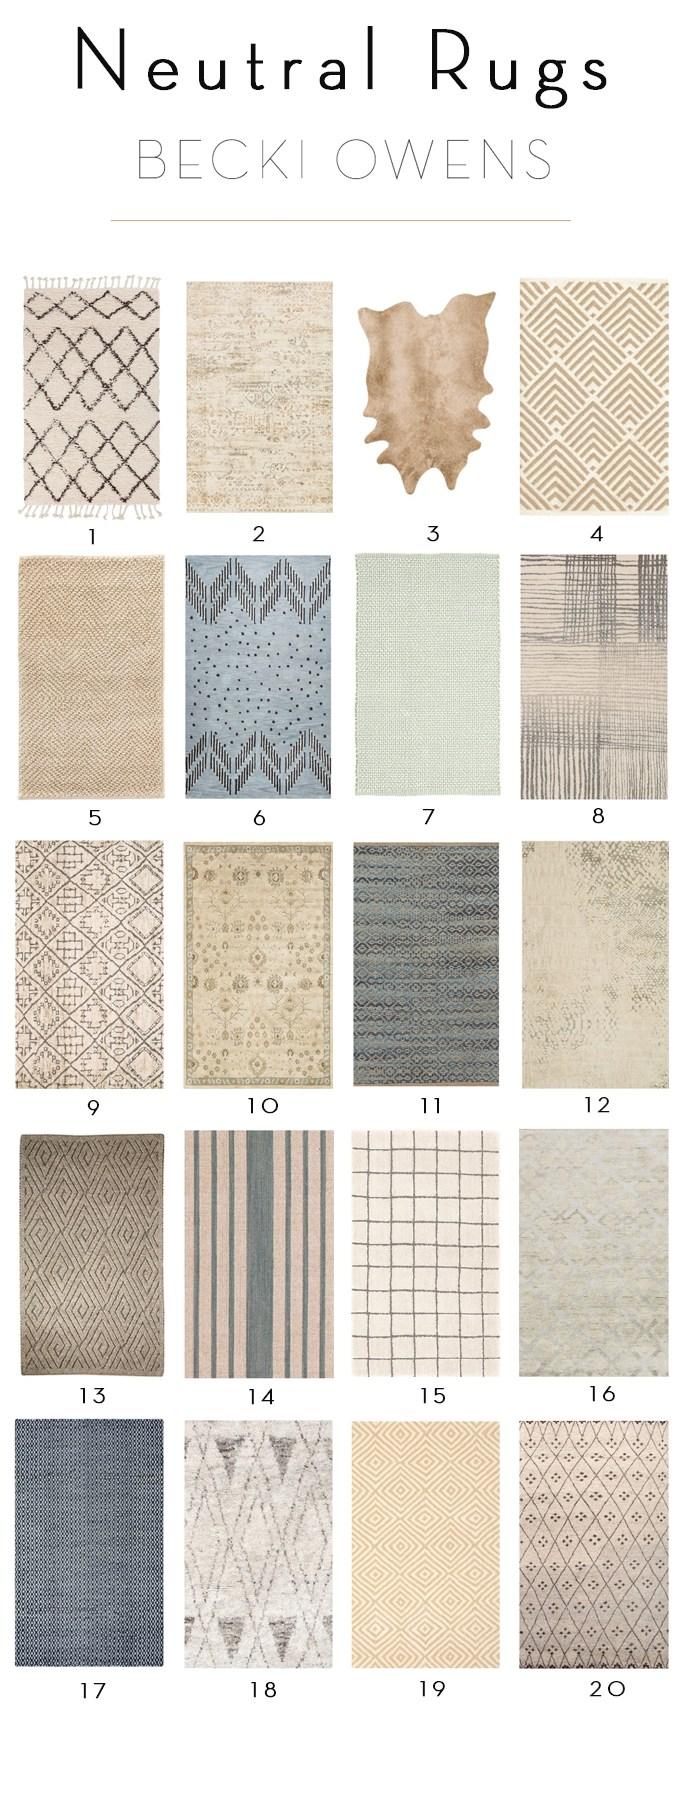 20 neutral rugs 25% off JQGCRGL